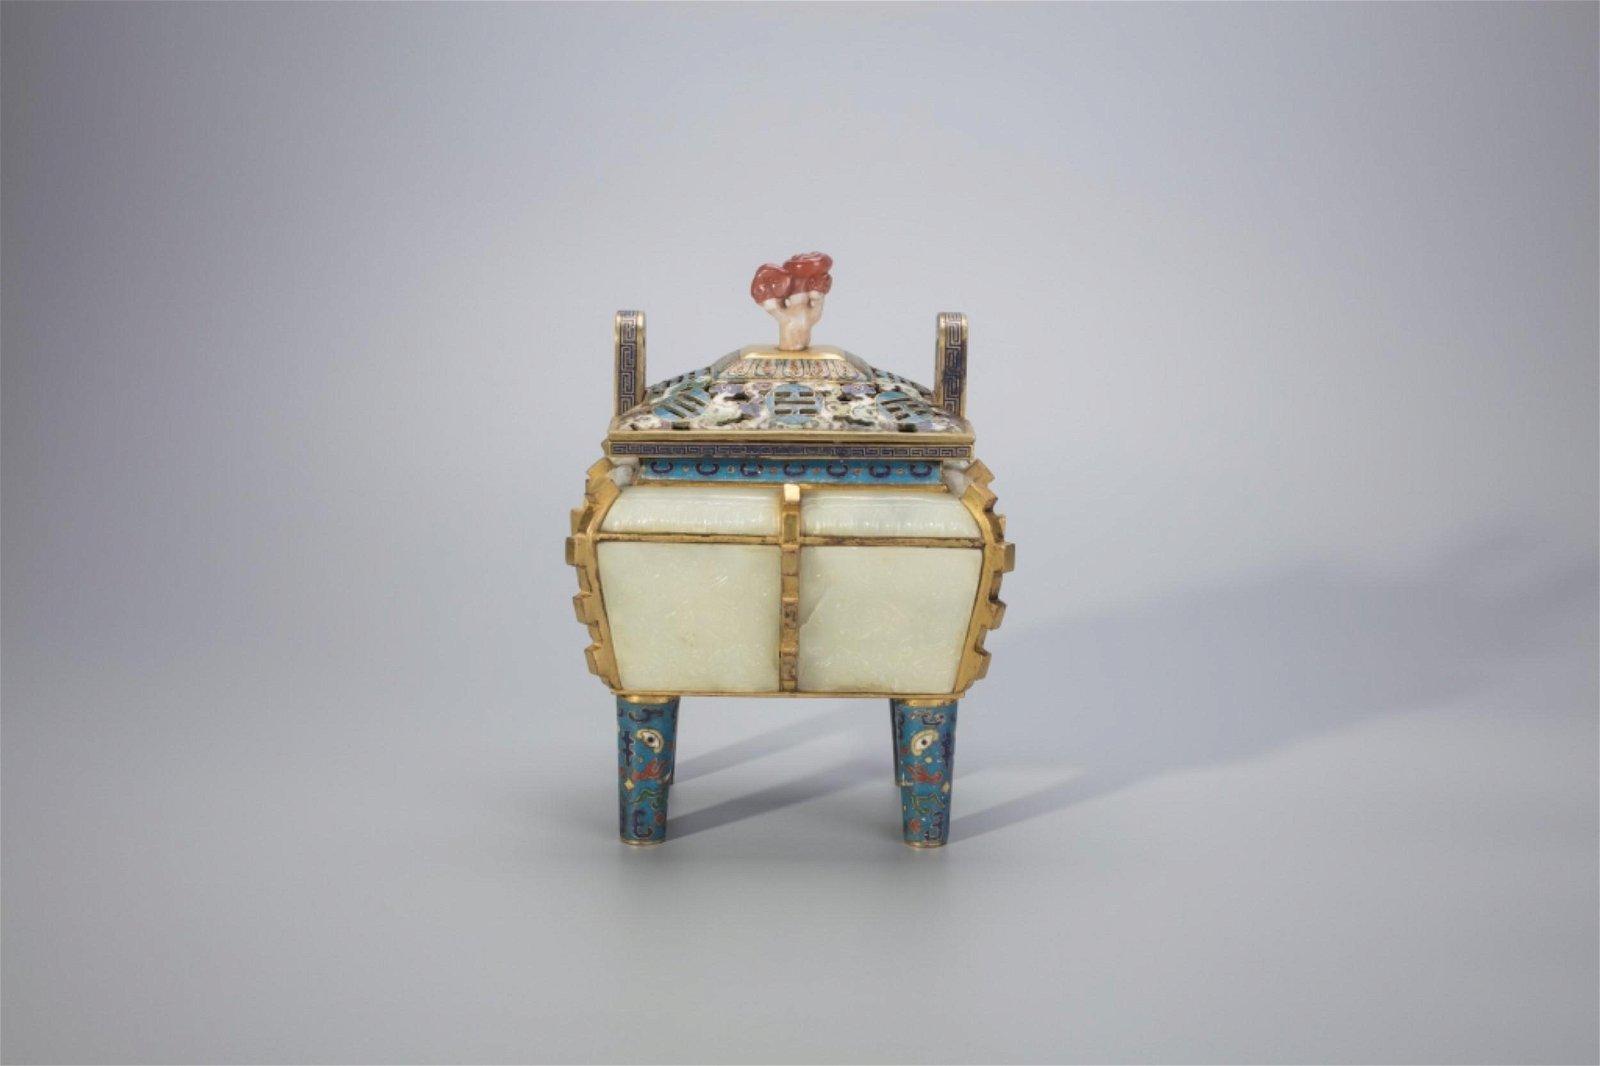 Chinese Jade Paneled Cloisonne Incense Burner